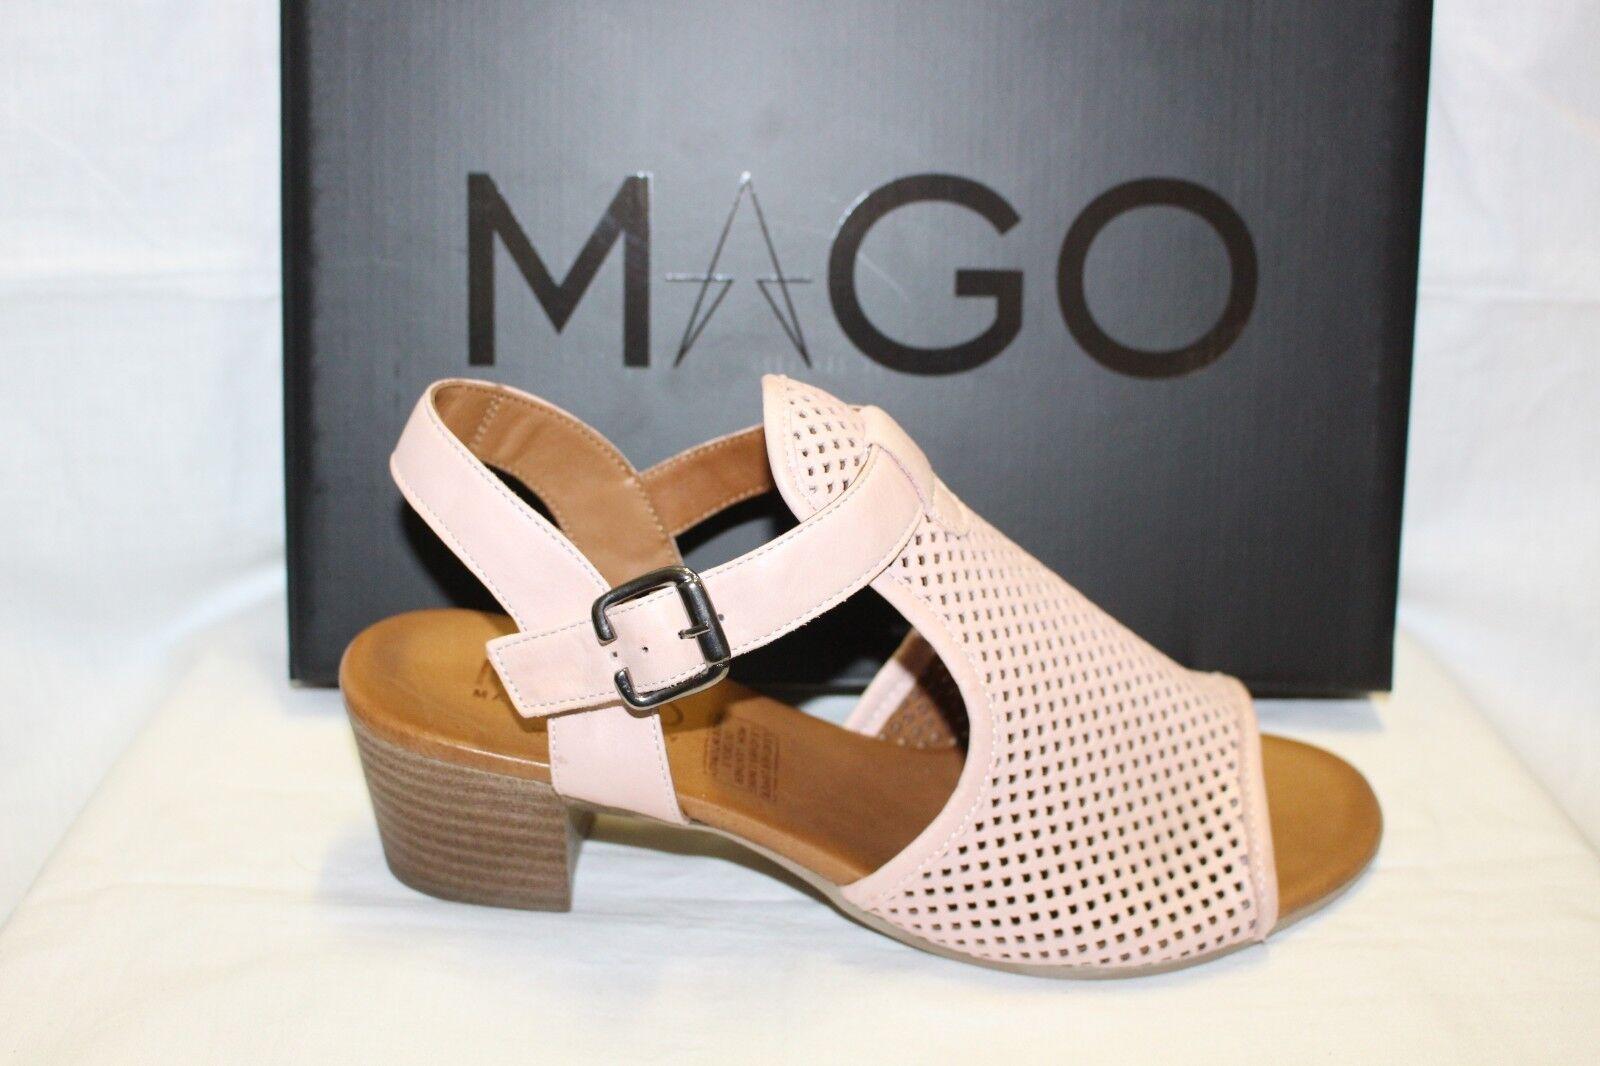 produttori fornitura diretta LADIES scarpe FOOTWEAR - Mago sandal - Lars Lars Lars flesh  sconto online di vendita